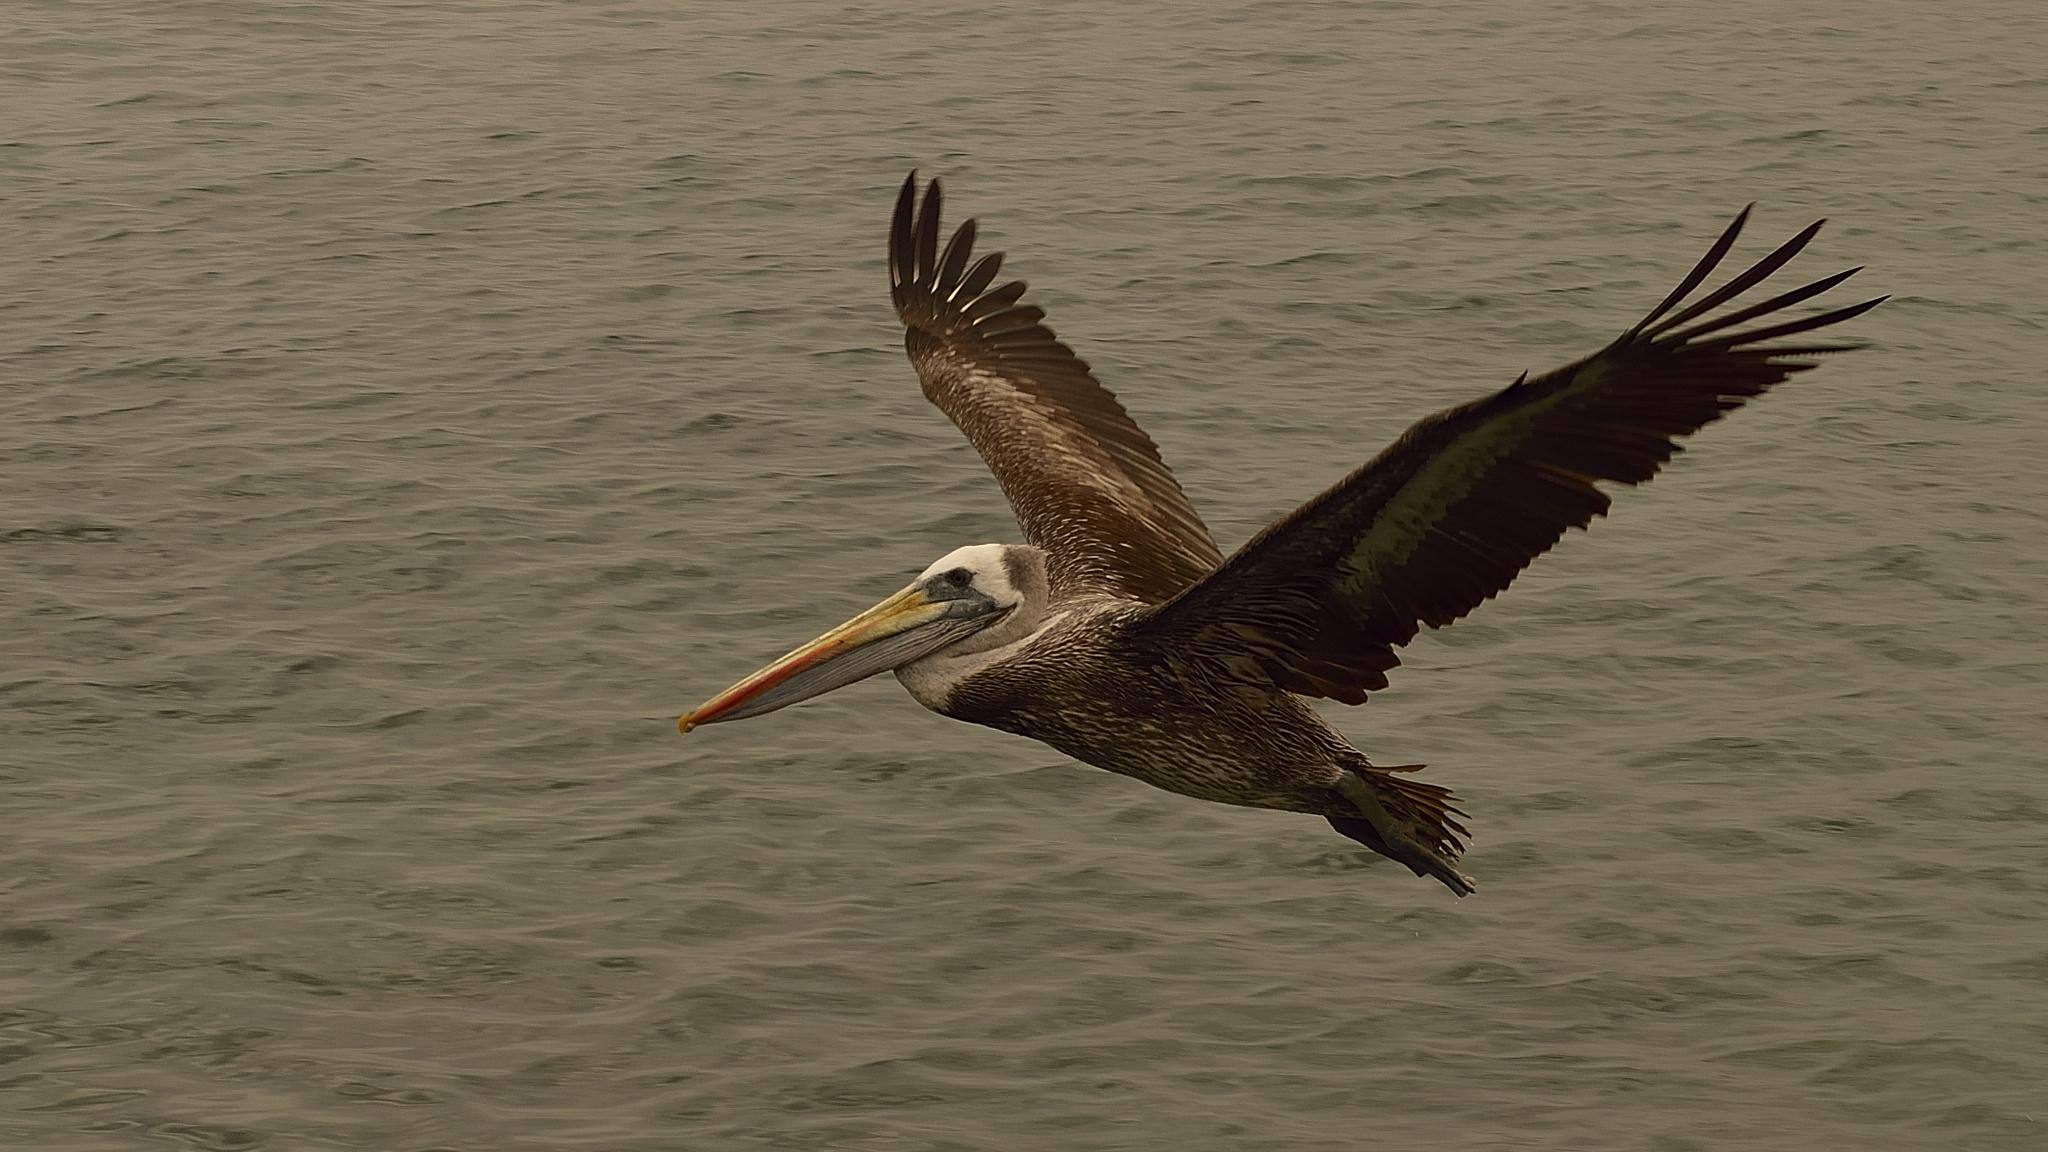 Pelican (5) by milualin2006